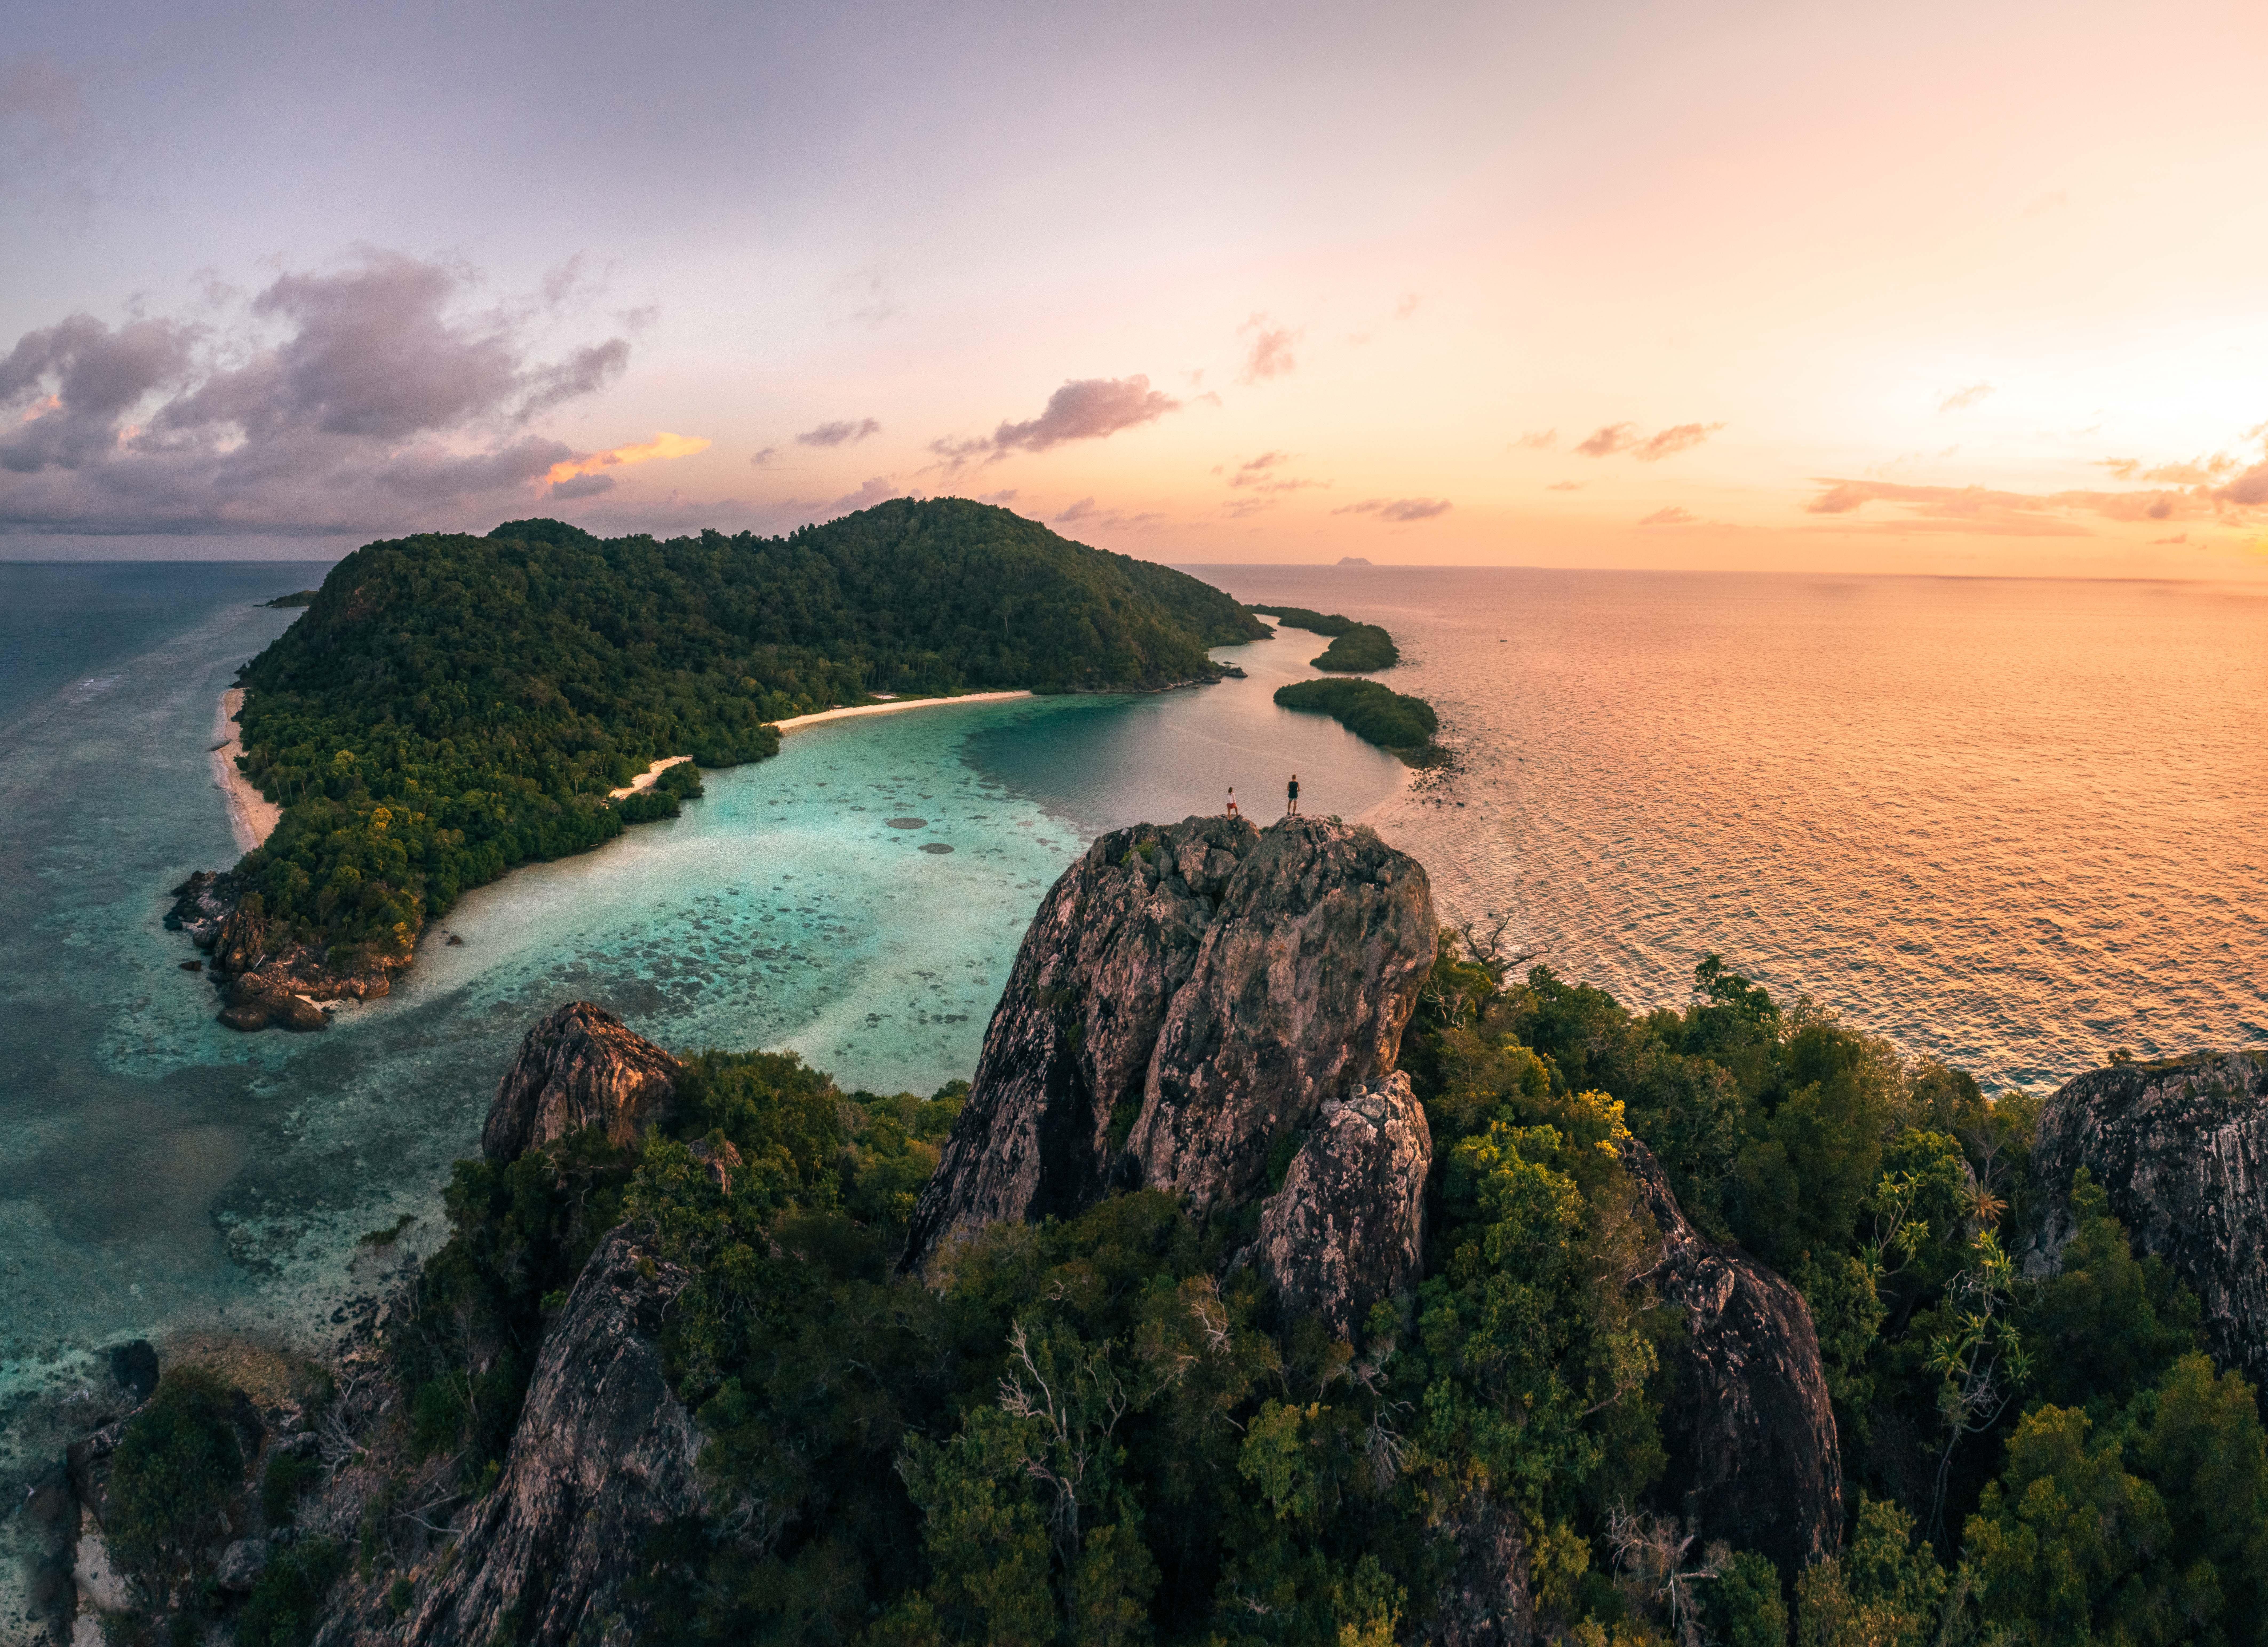 aerial_batu_tokong_close_up_in_distance_coconut_beach (1)